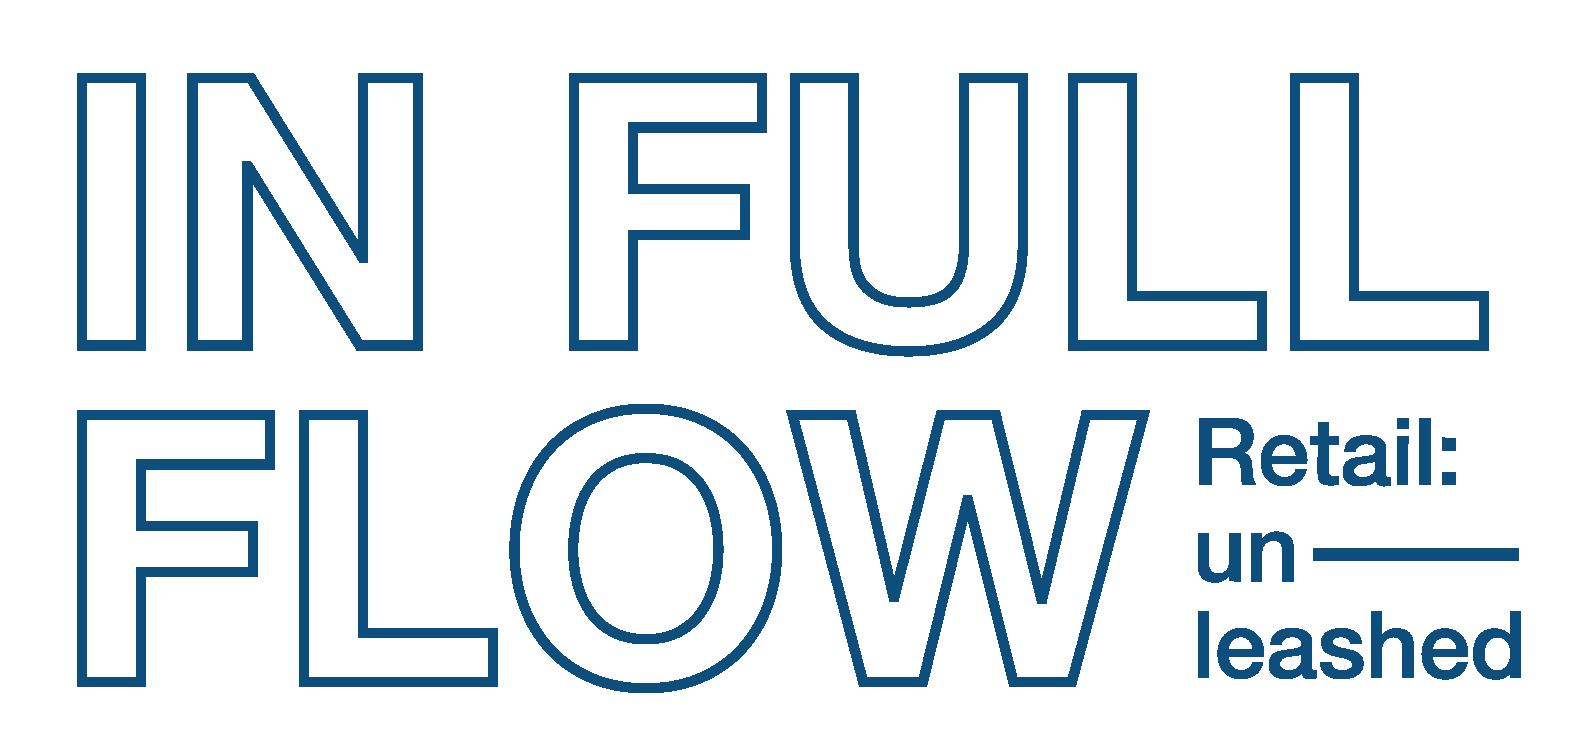 Euroshop_Logo-01 crop